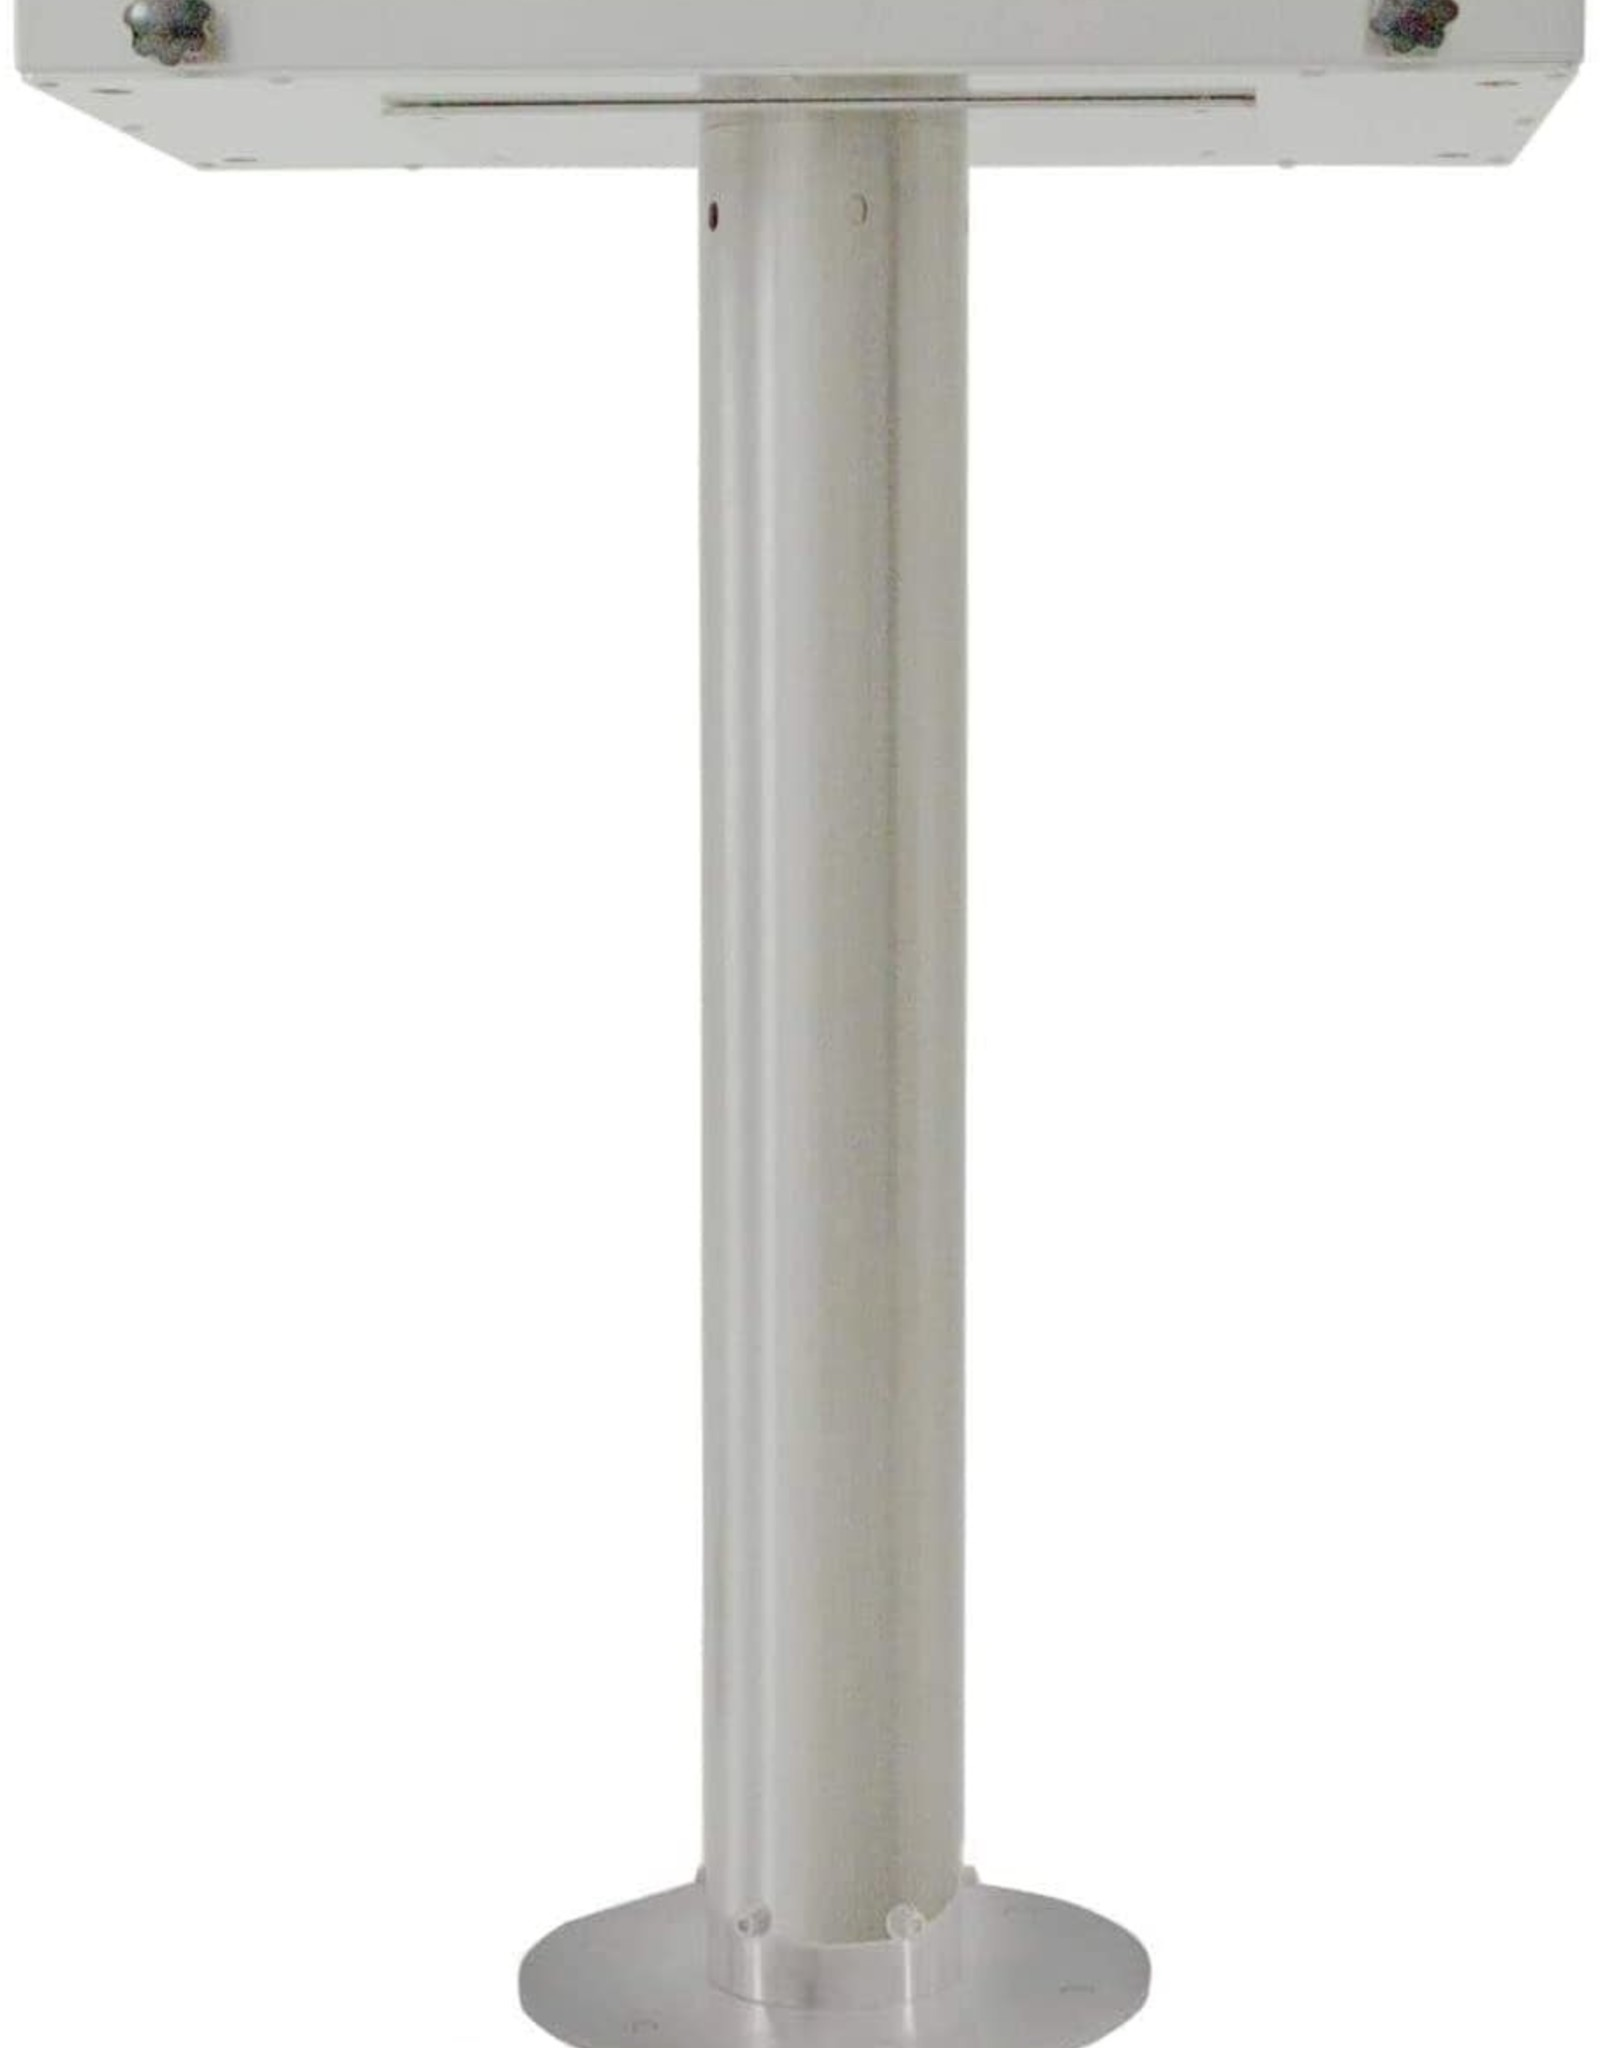 Blaze Outdoor Products Blaze Professional 10-Inch Marine Grade Portable Grill Pedestal - BLZ-PRTPED-MG10